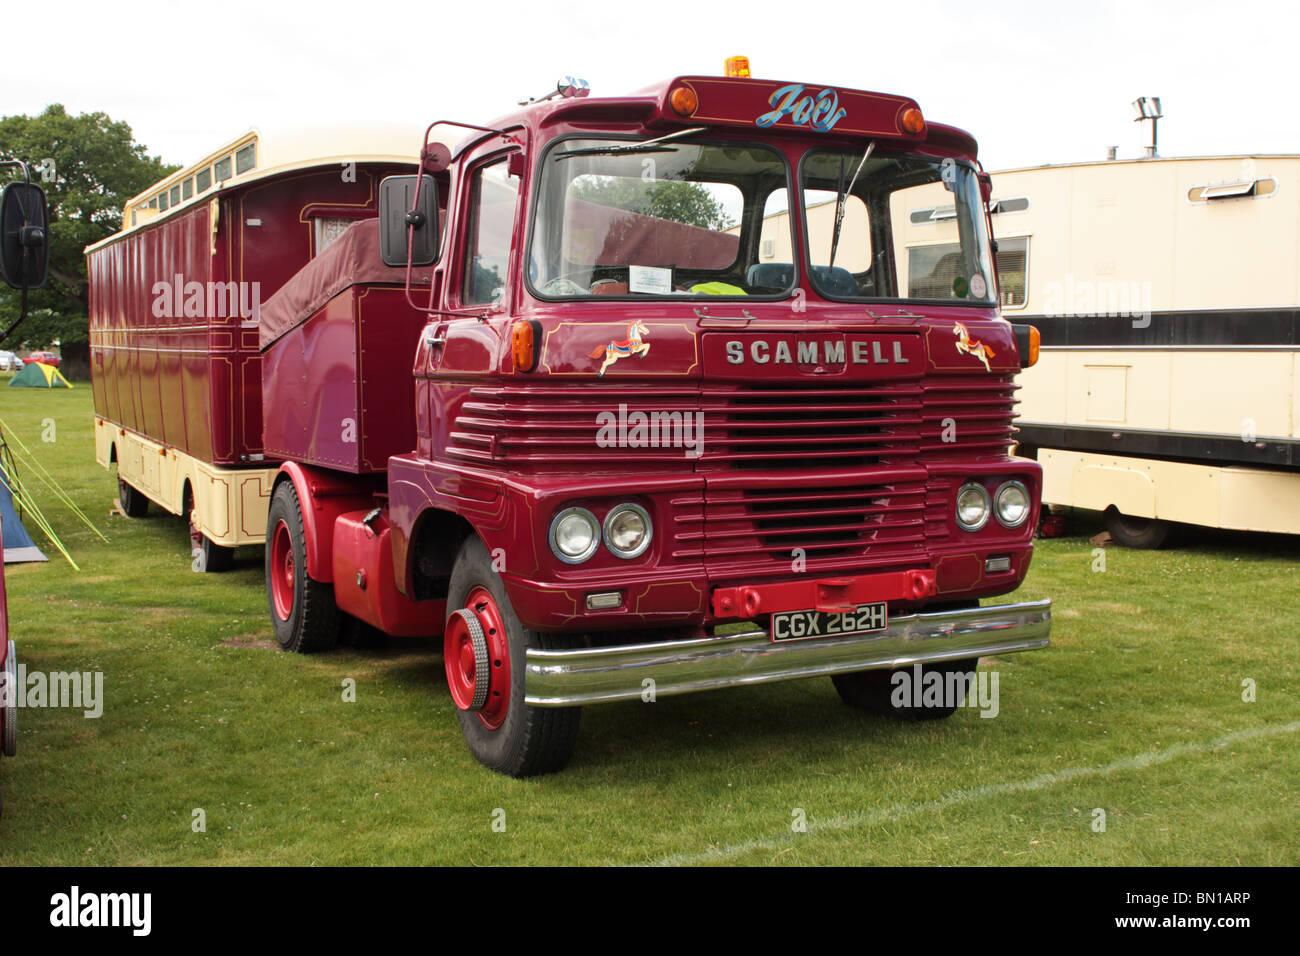 Classic British Trucks - Stock Image